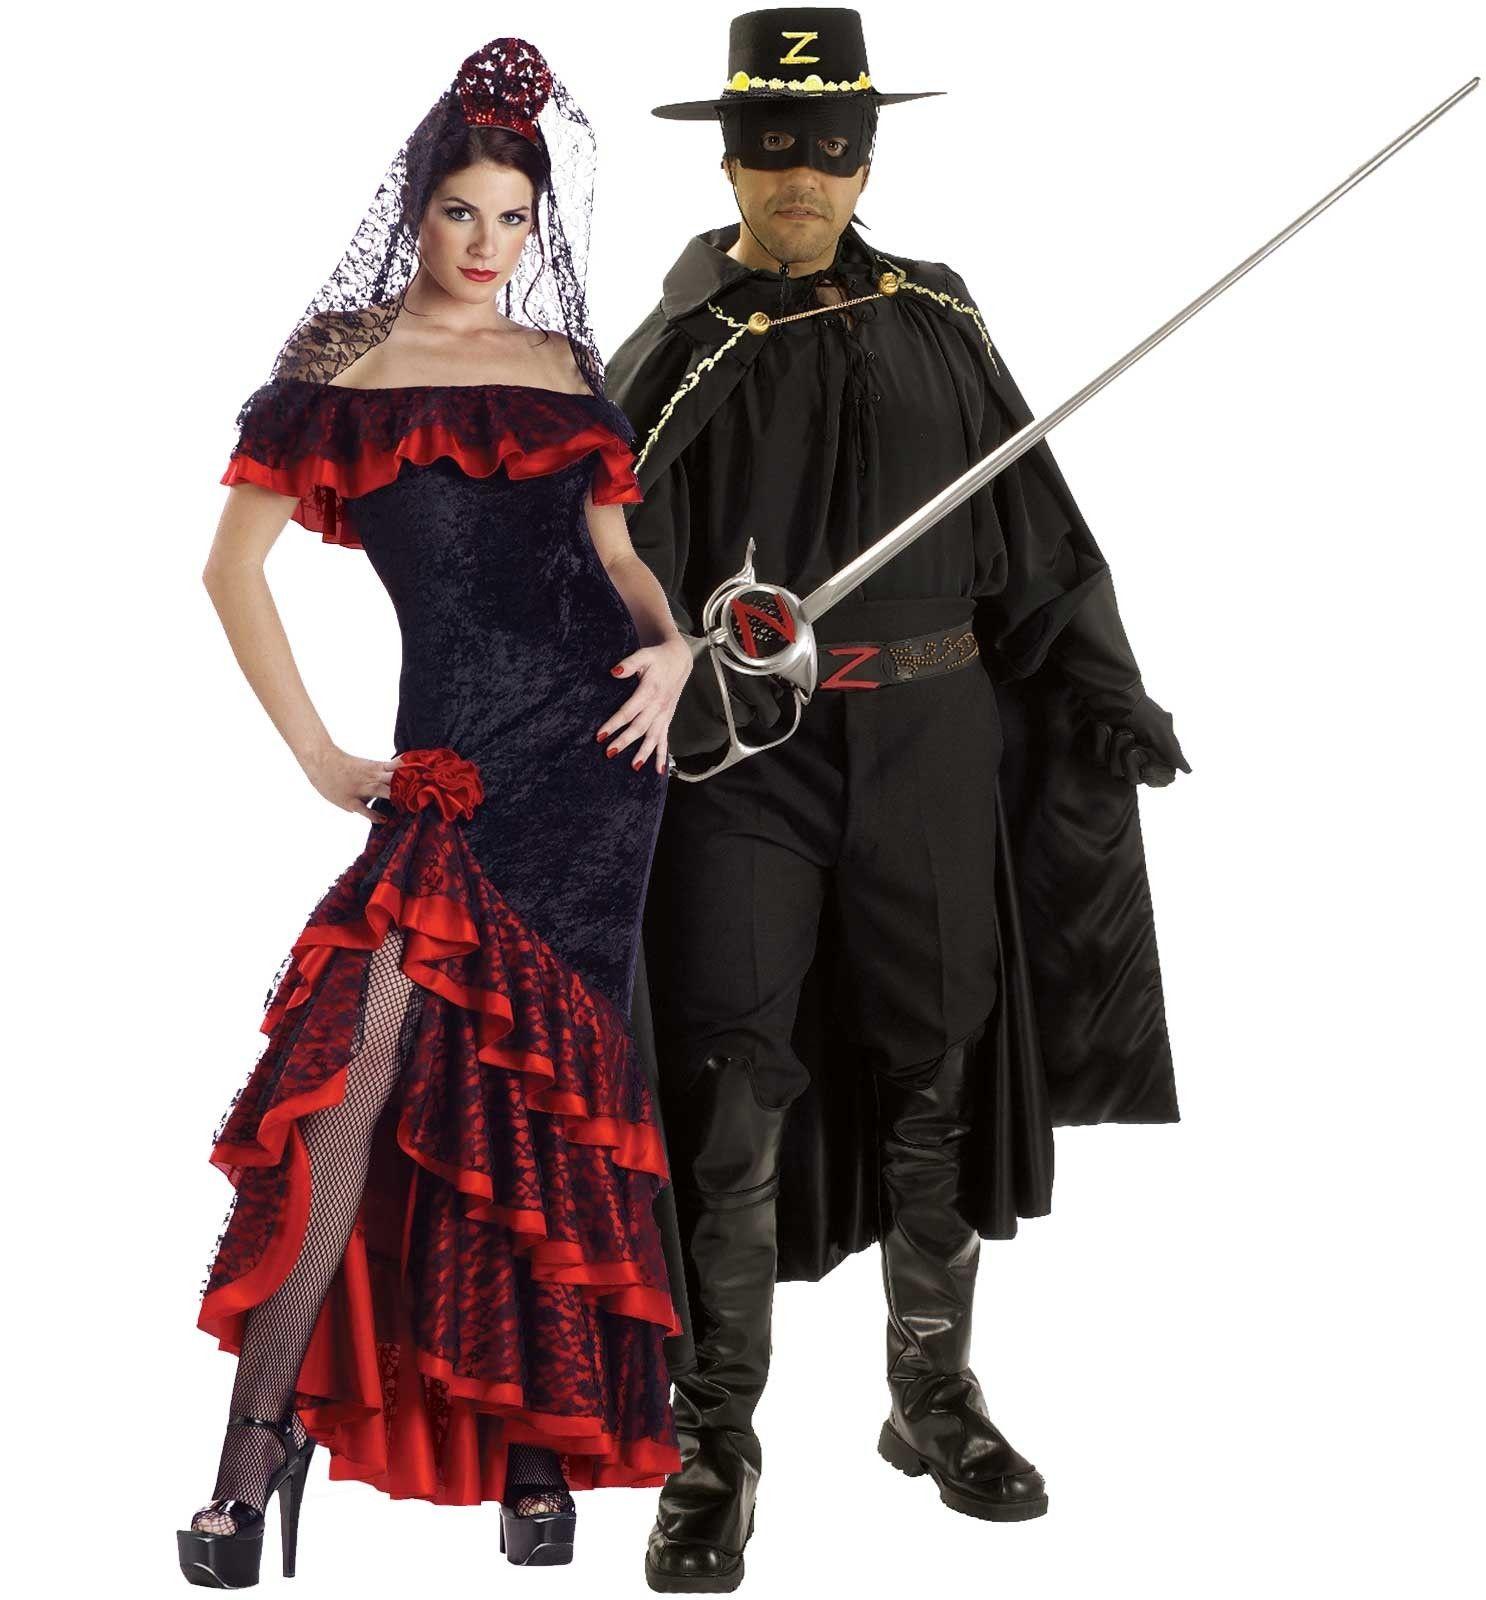 Zorro And Elena Couples Costume  Couples Costumes -1651